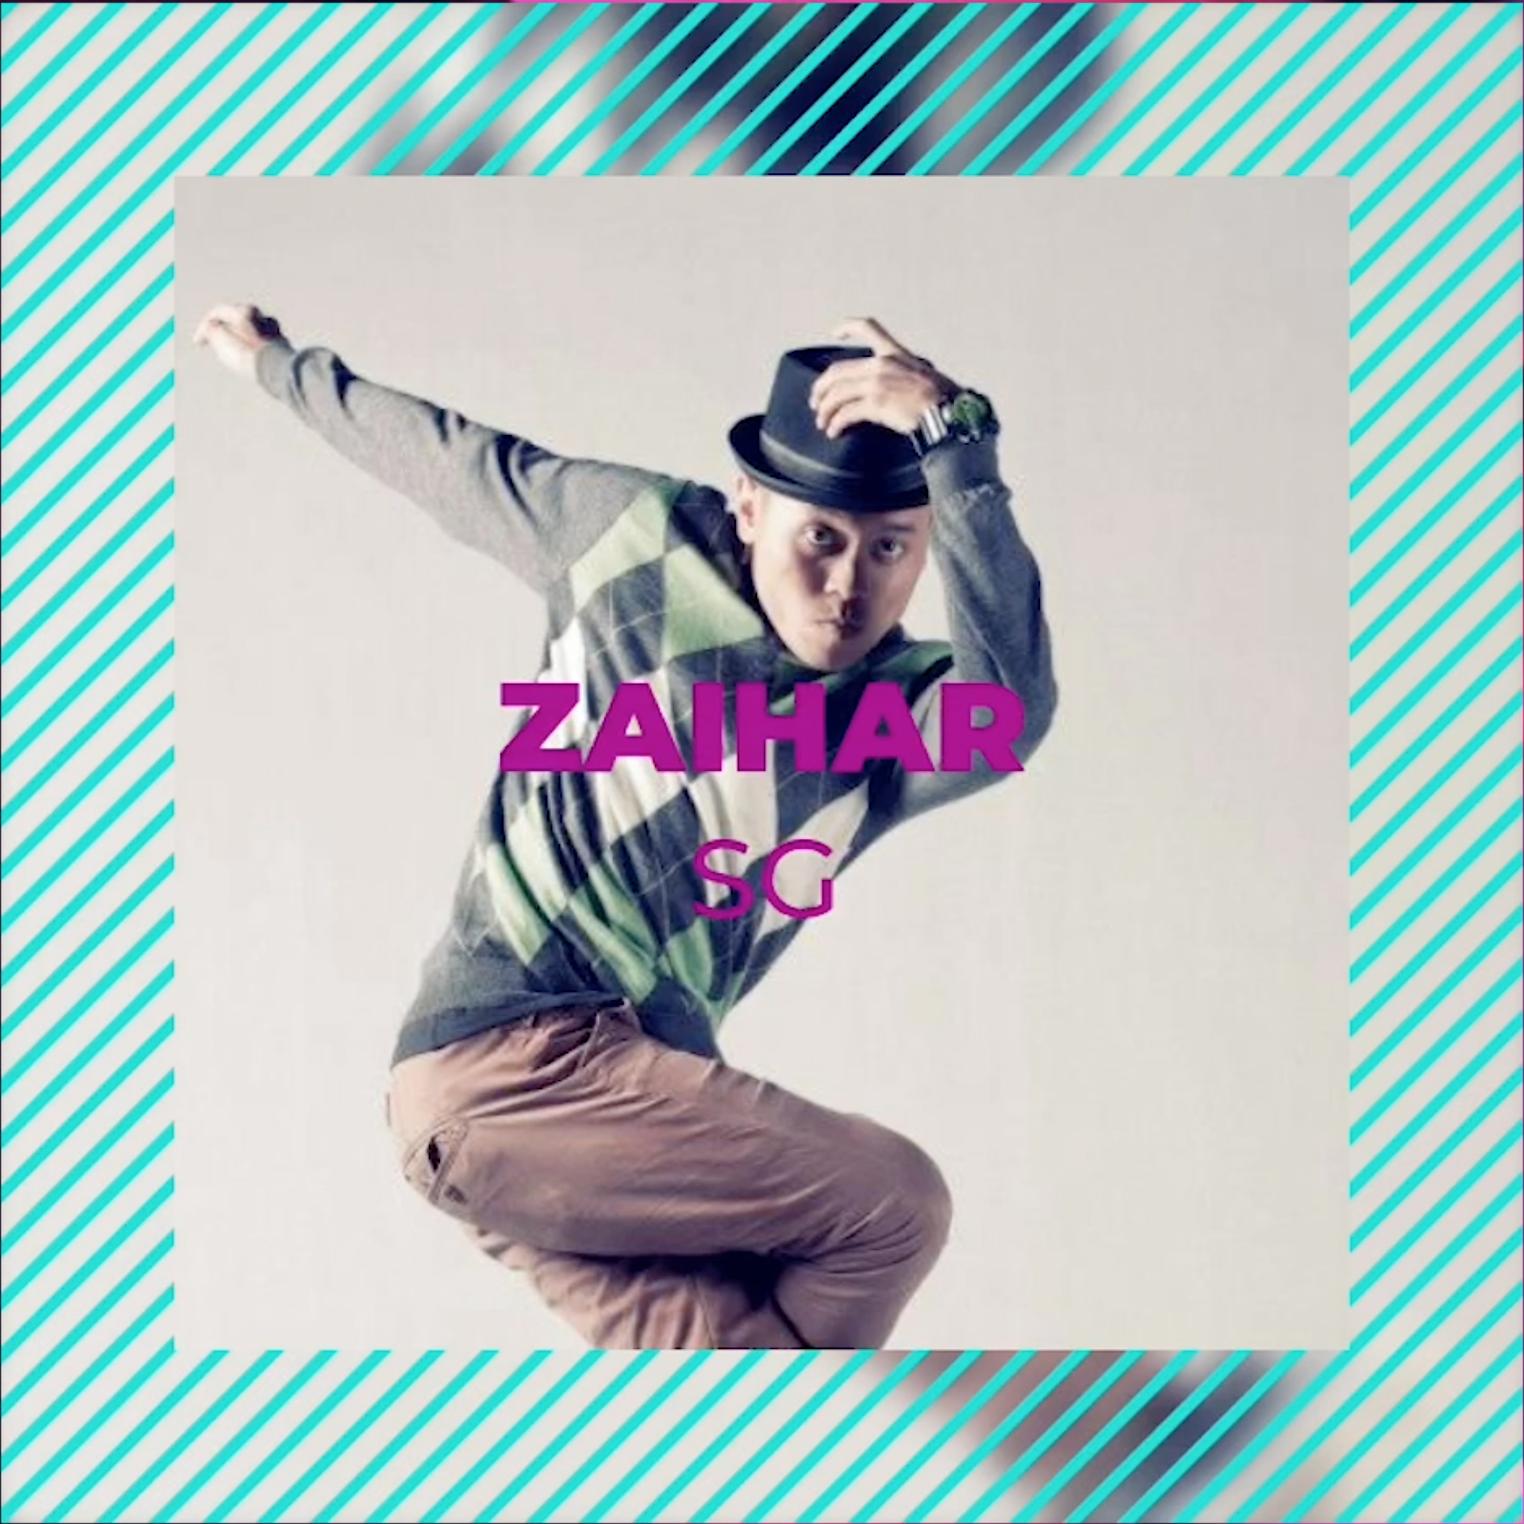 s24judge_zaihar